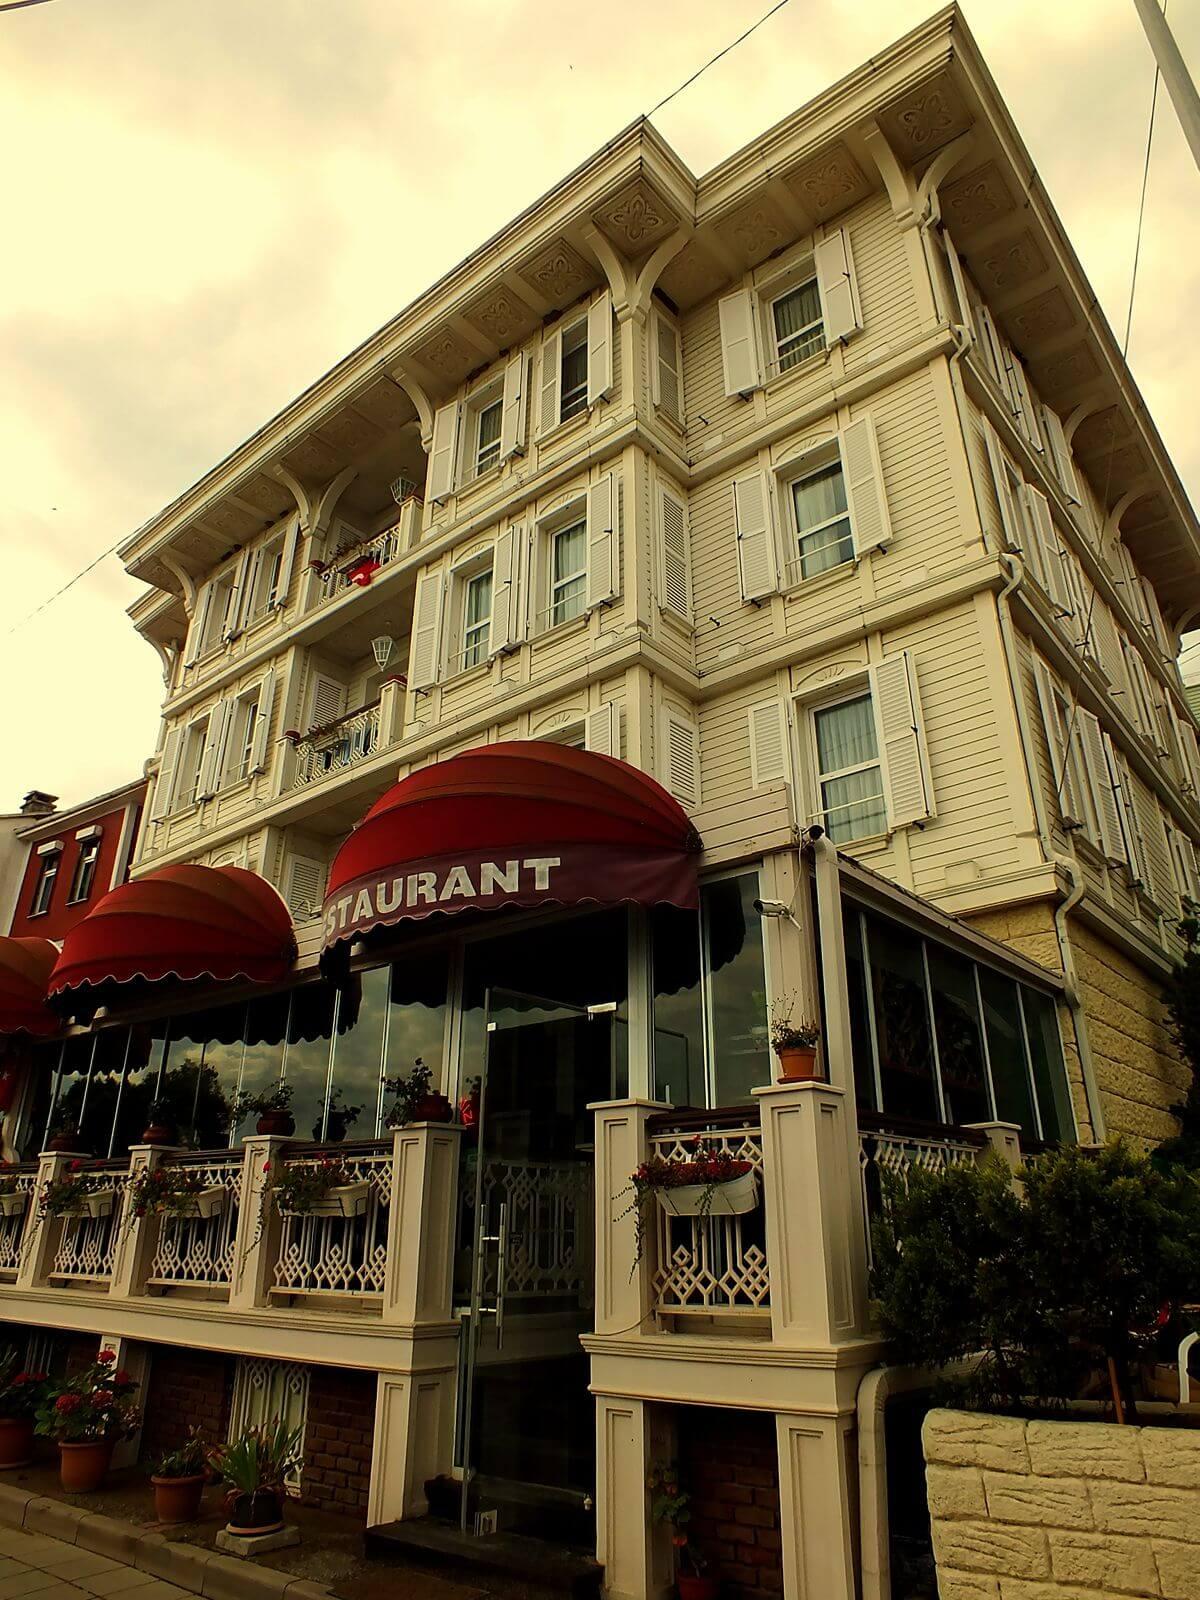 Tirilye Gezisi Trilyalı Otel